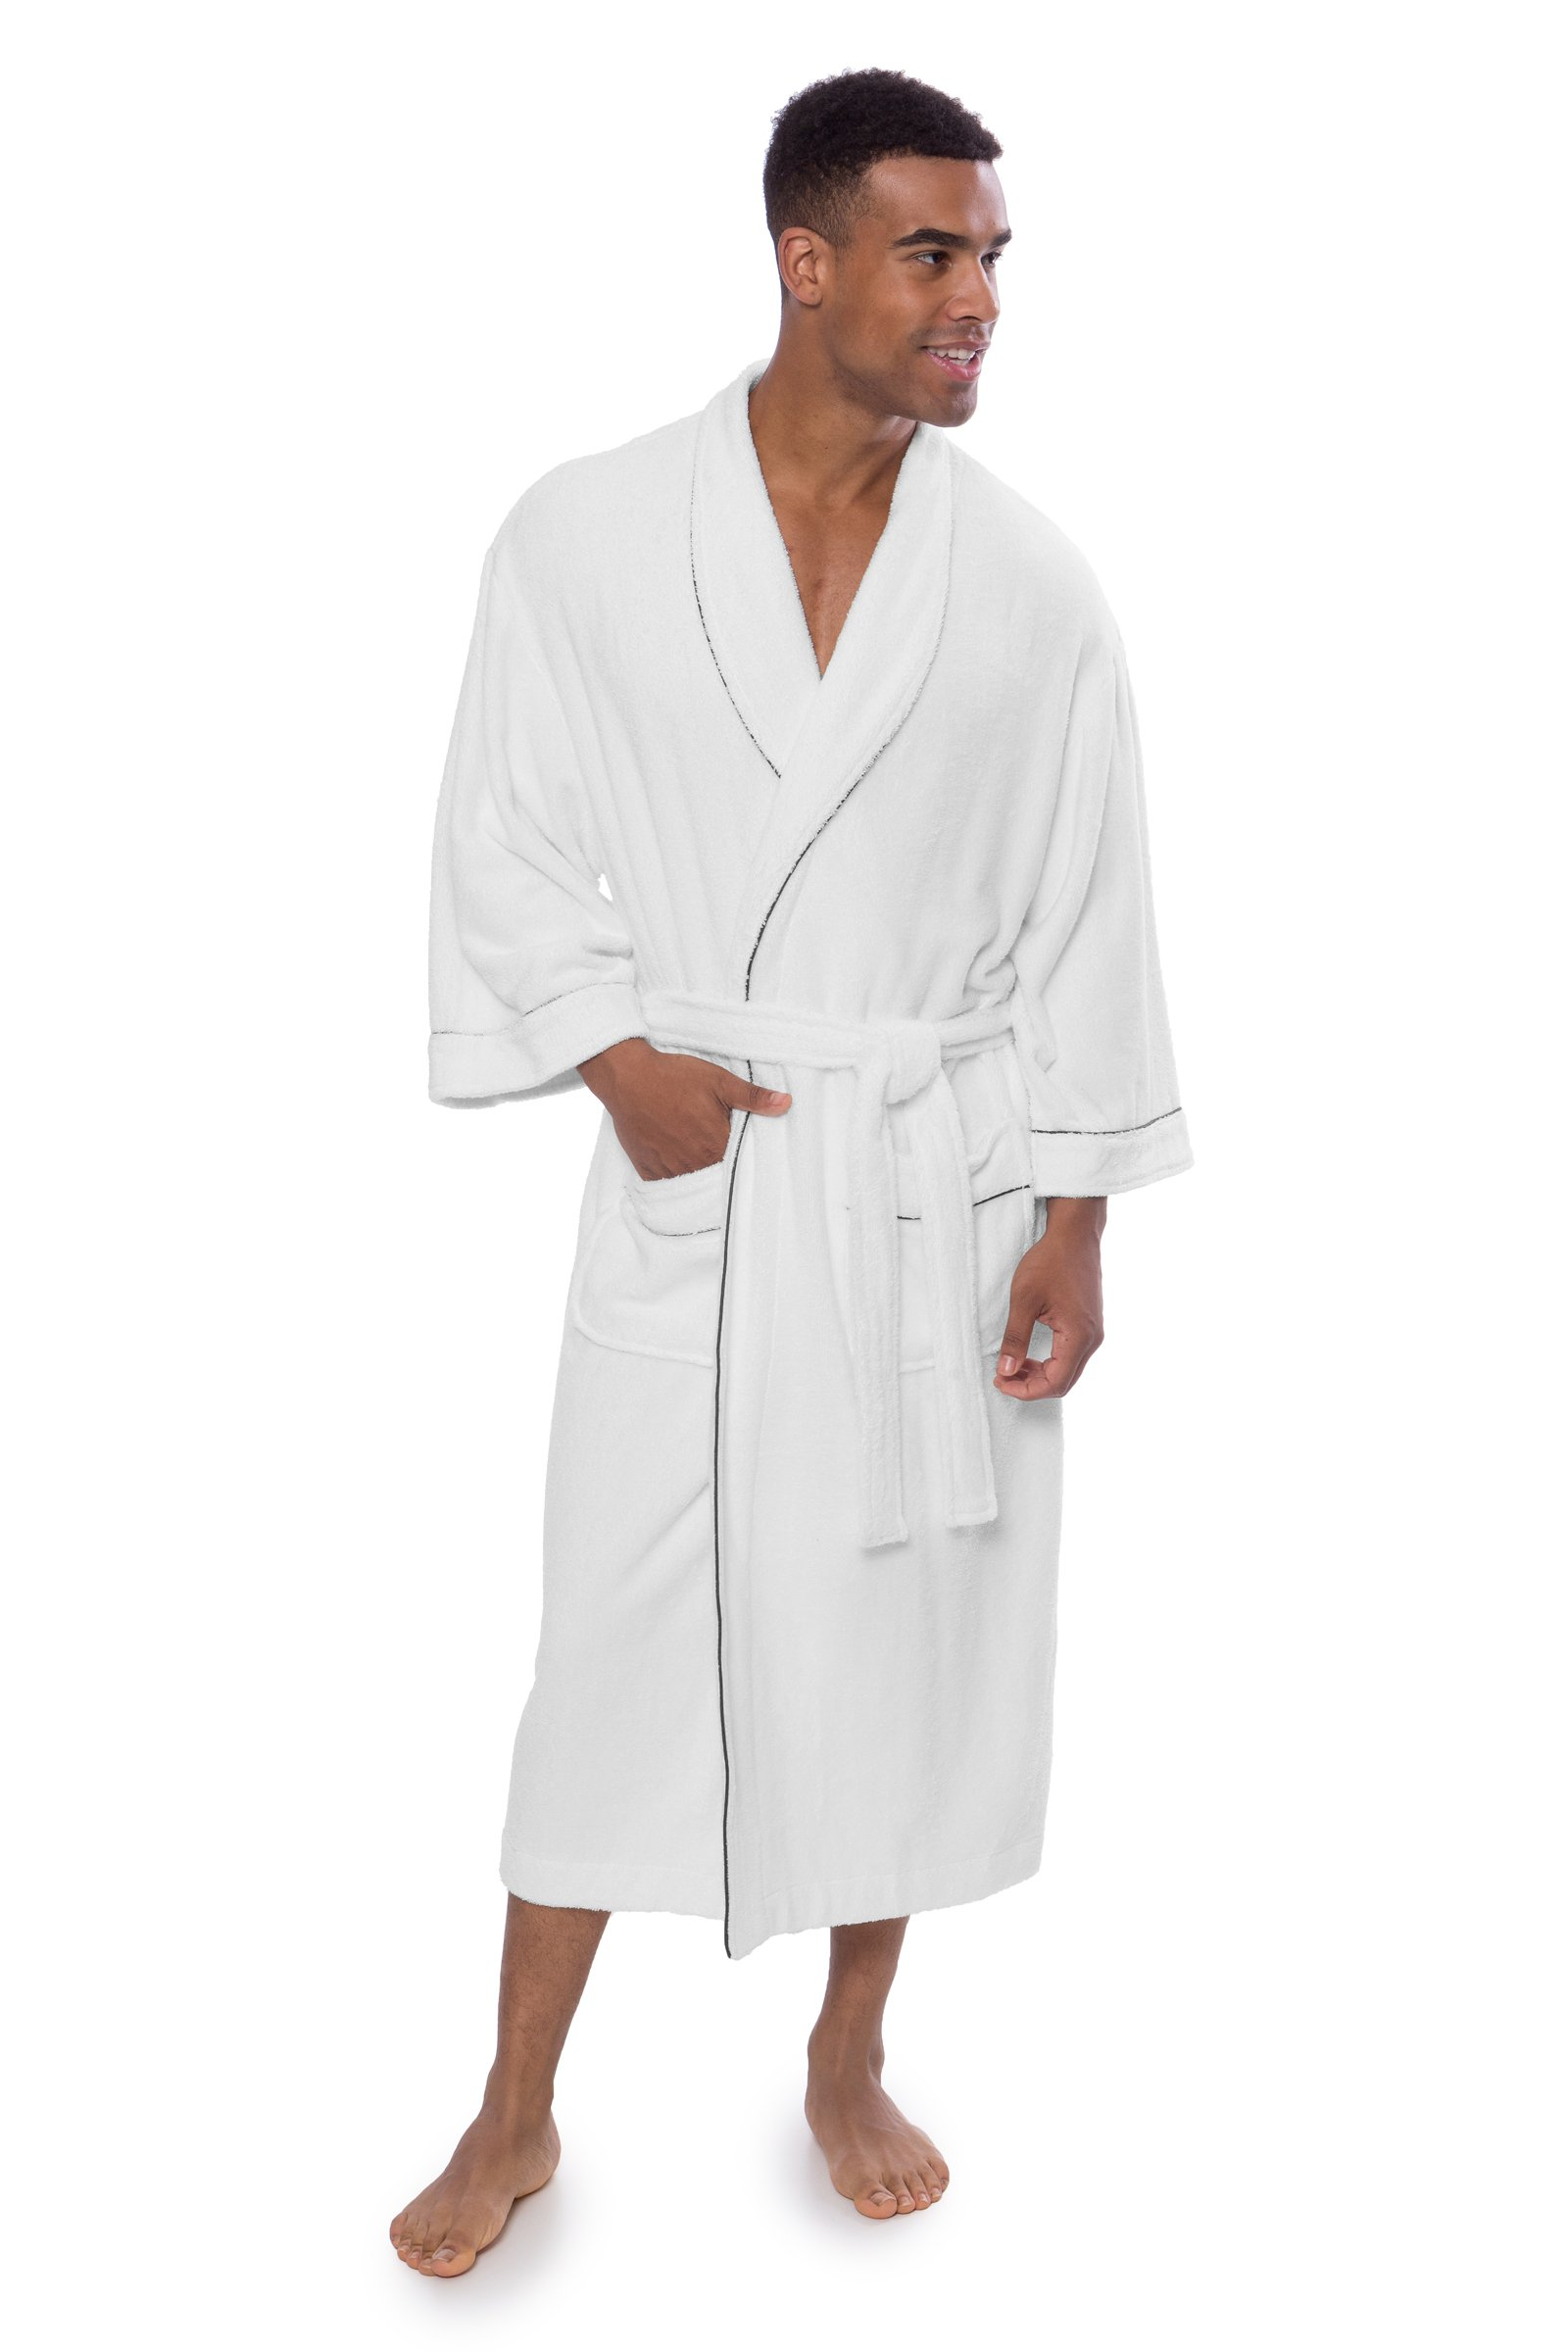 Men's Terry Cloth Bathrobe Robe Gift Ideas Presents for Men Dad Boyfriend Men's 0051-LXL,Natural White